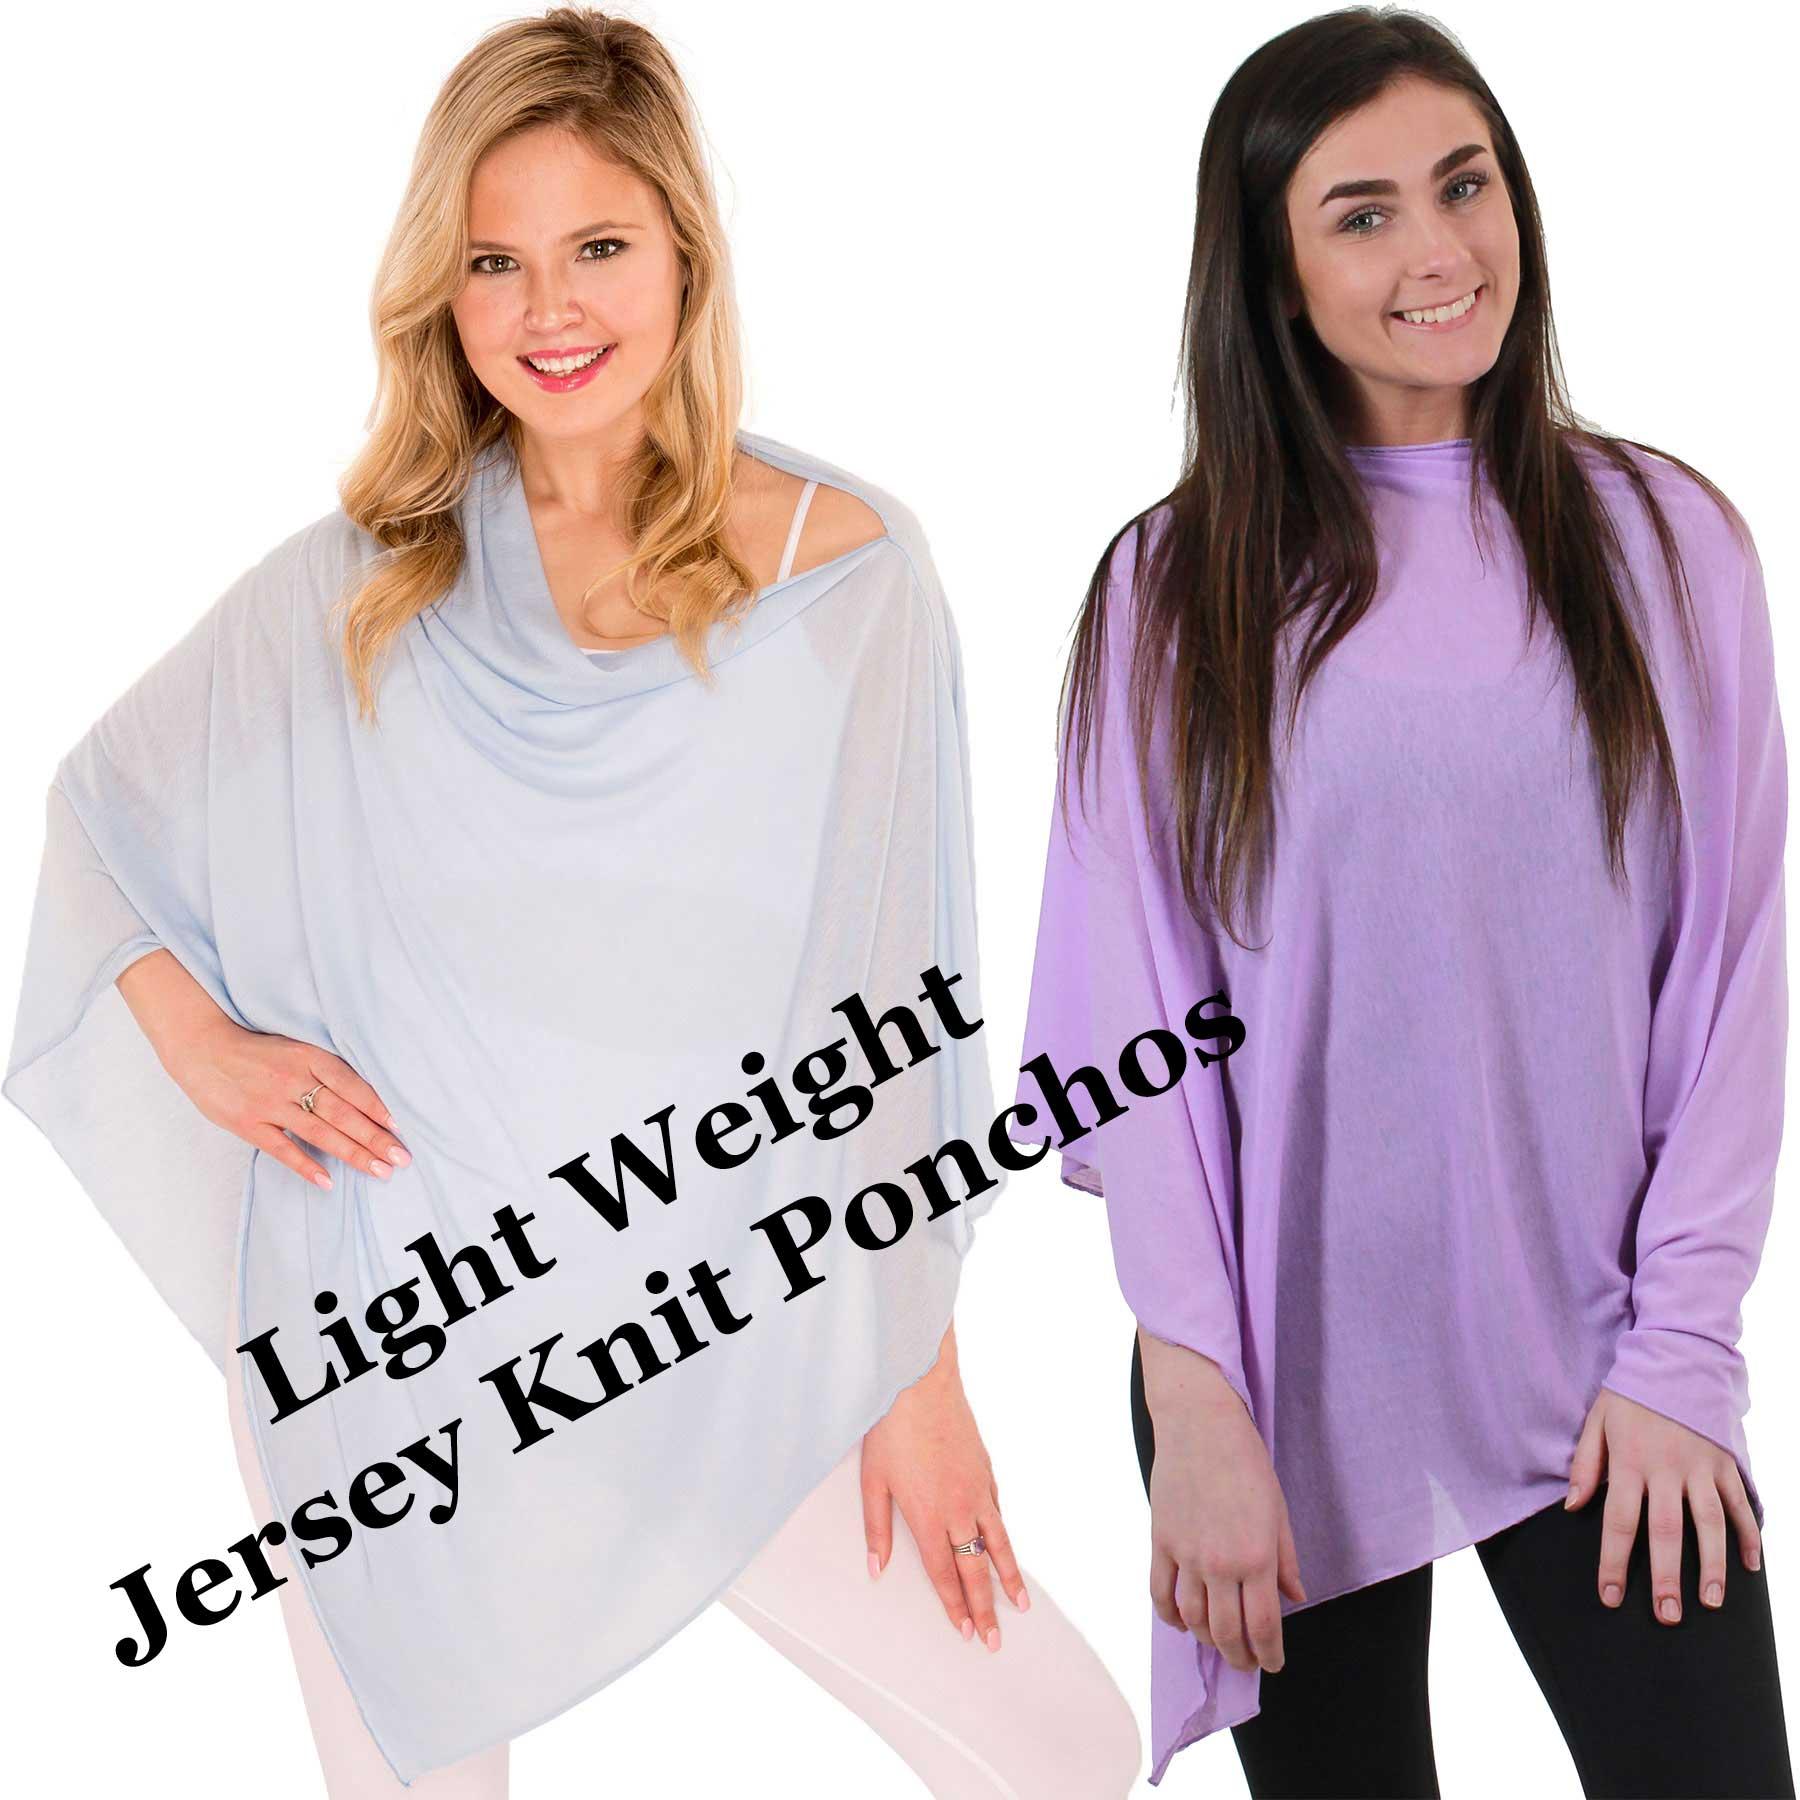 Poncho - Jersey Knit